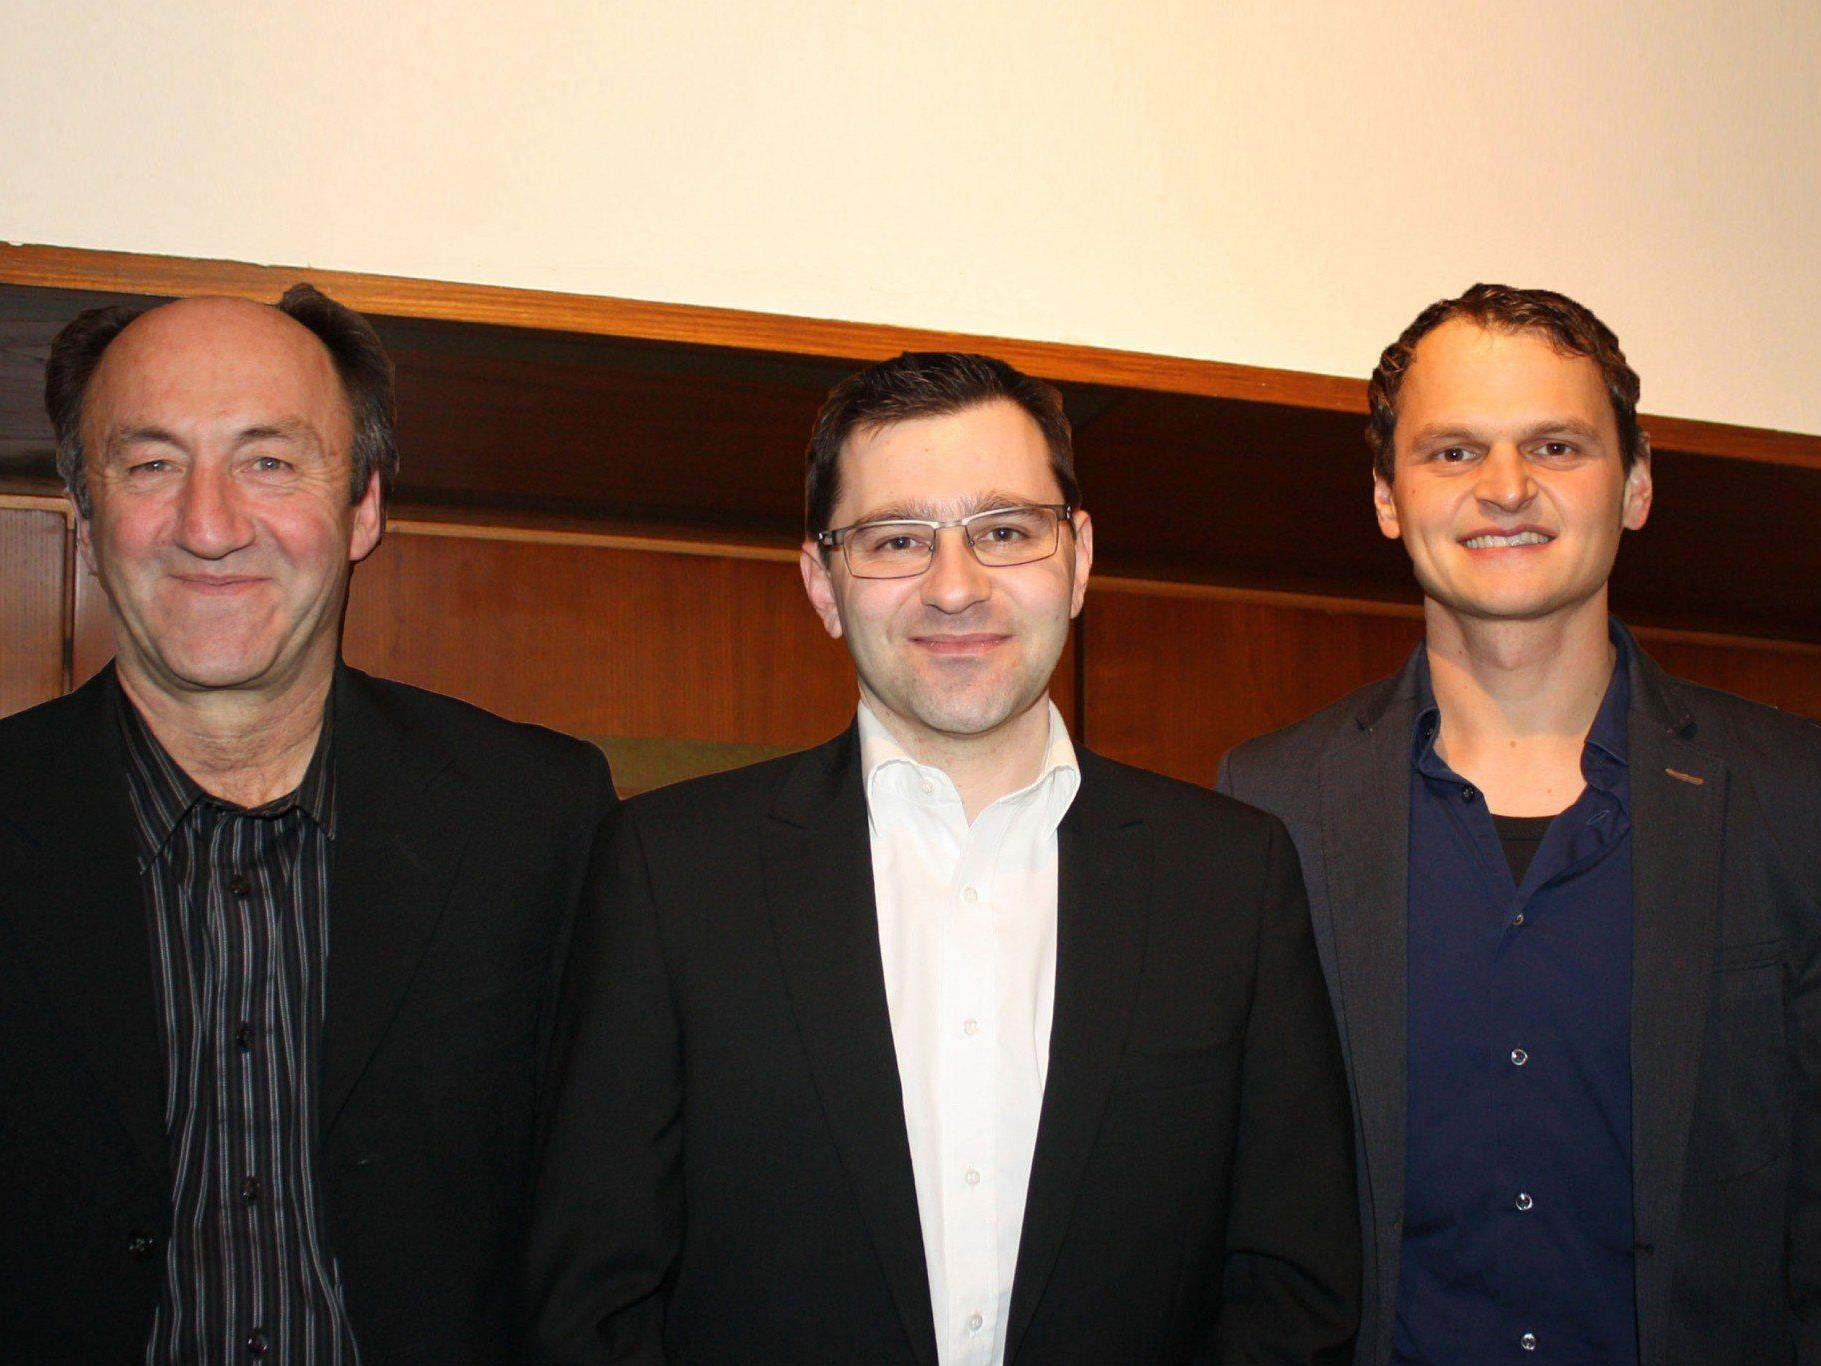 Wechsel an der Spitze der VHS-Berufsreifeprüfung (v. li.): Lothar Köb, Michael Grabher, Markus Erath.